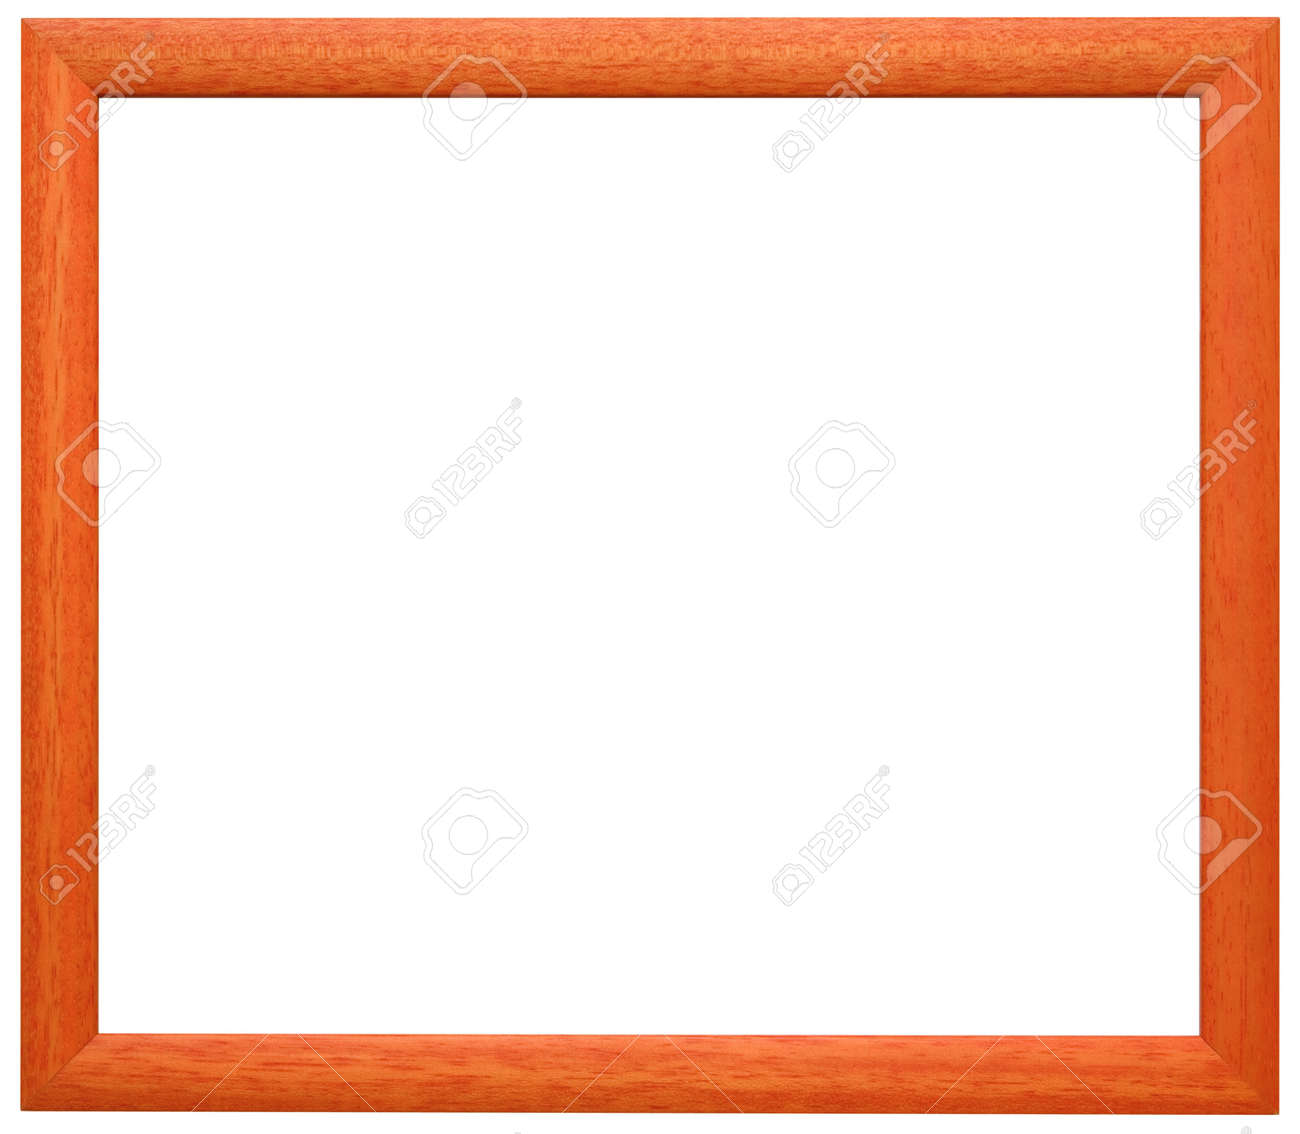 Simple orange wooden frame Stock Photo - 8529320